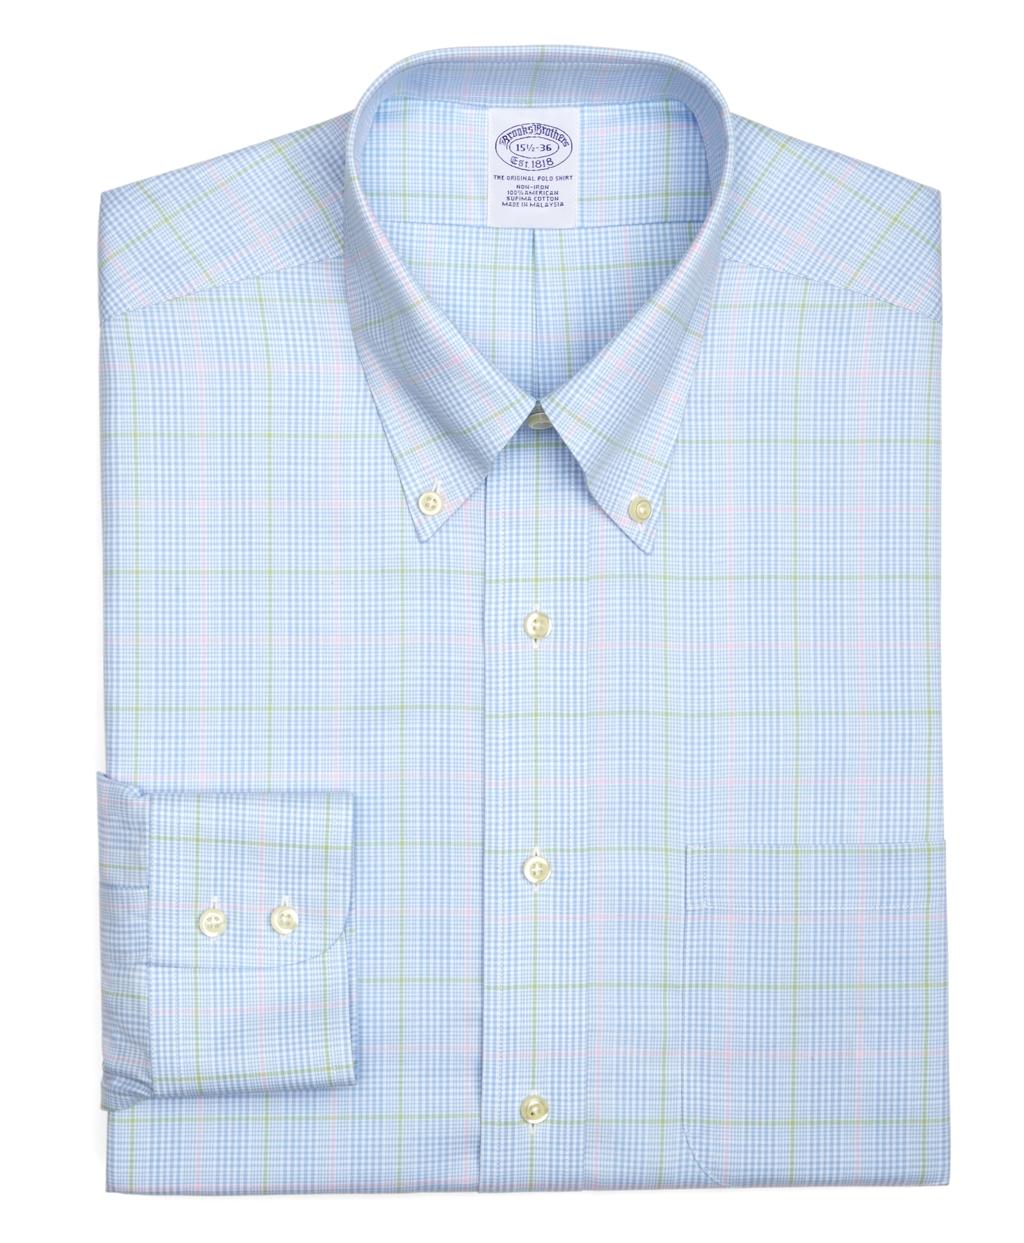 Lyst brooks brothers supima cotton non iron slim fit for Supima cotton dress shirts